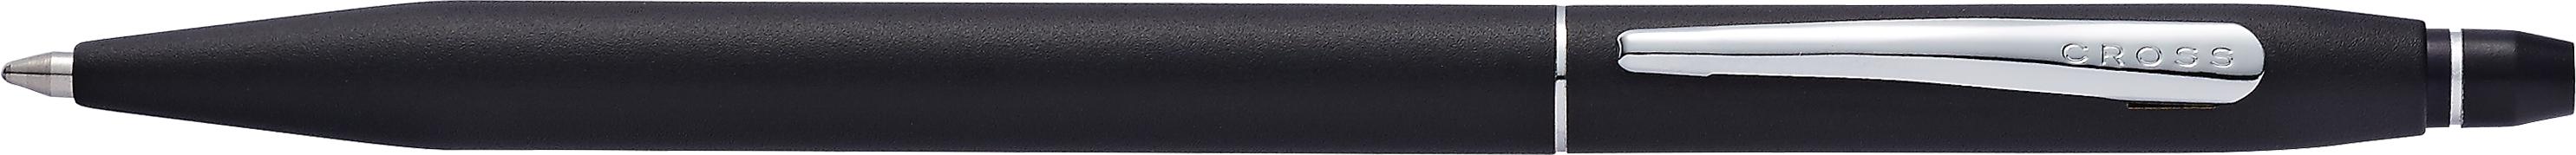 Click Classic Black Ballpoint Pen